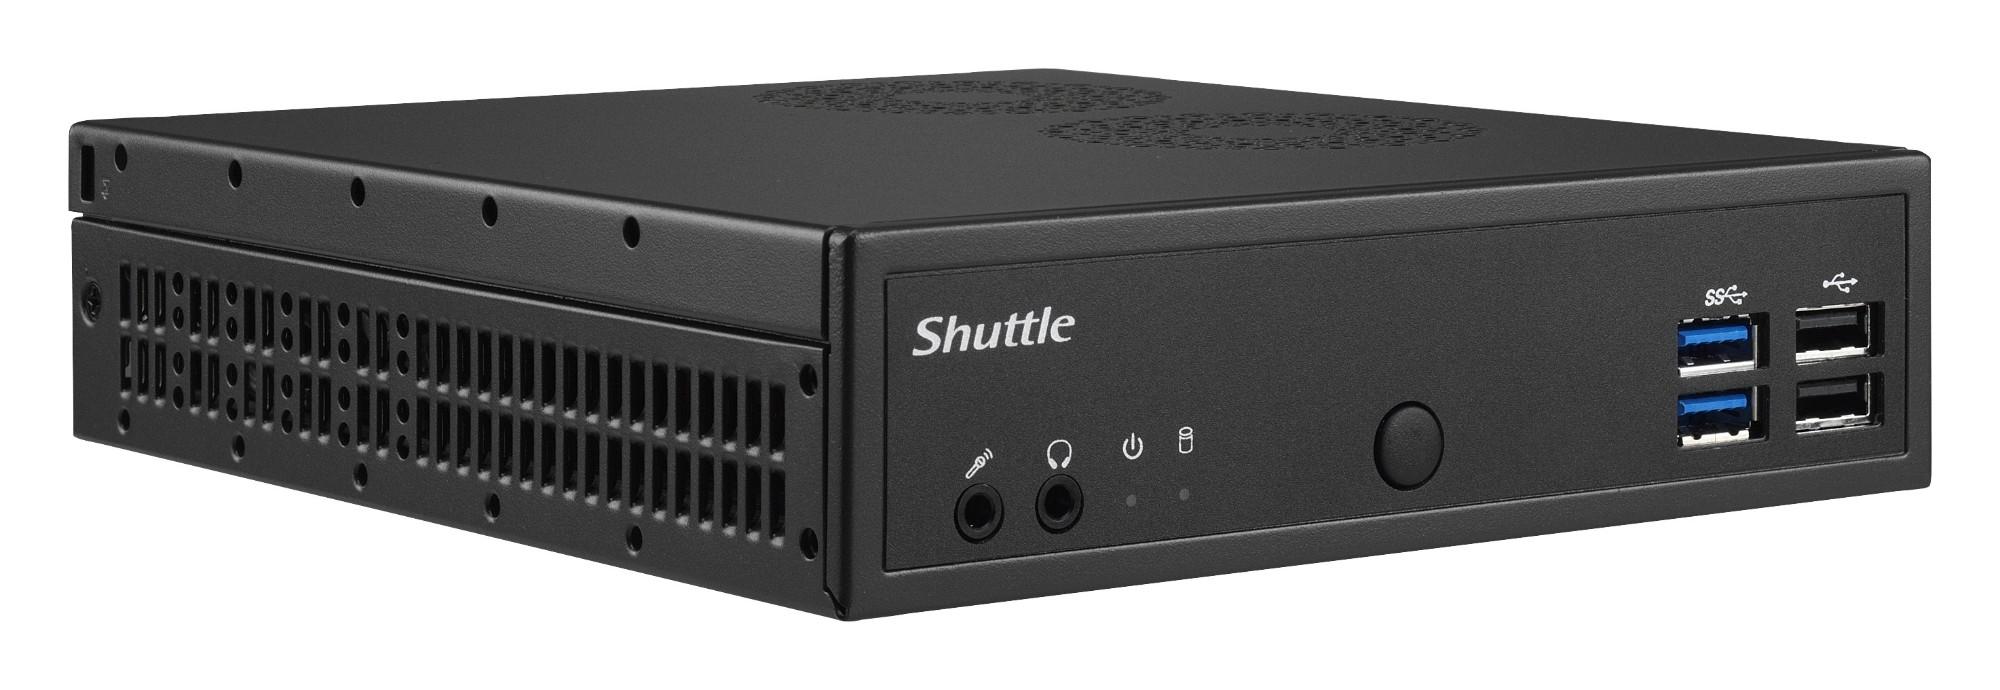 Shuttle XPÐ¡ slim DH02U BGA 1356 1.8GHz 3865U Black PC/workstation barebone